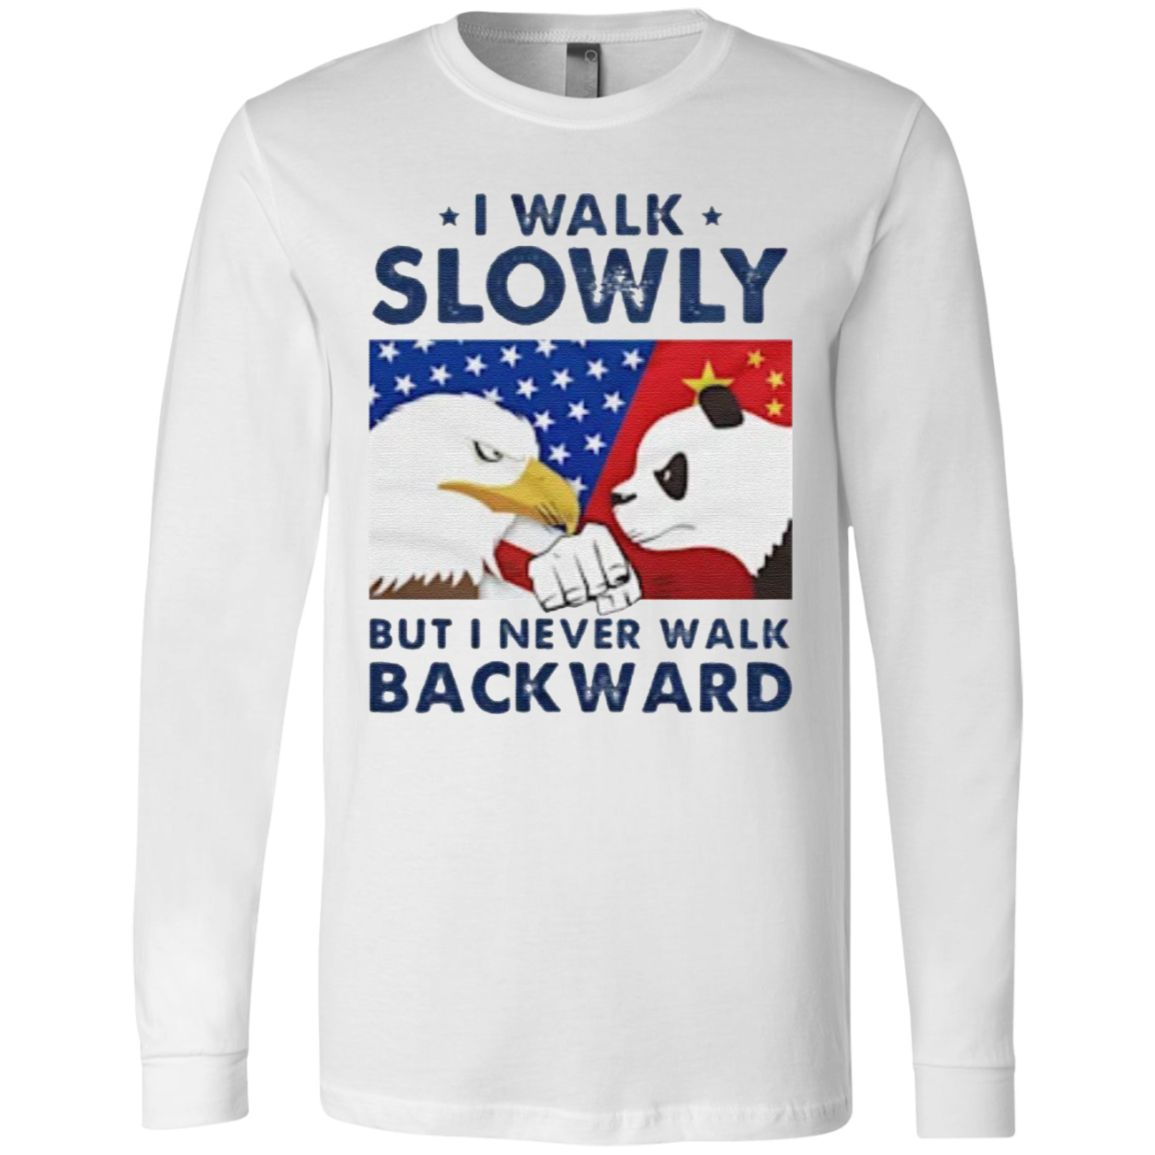 I Walk Slowly But I Never Walk Backward t shirt